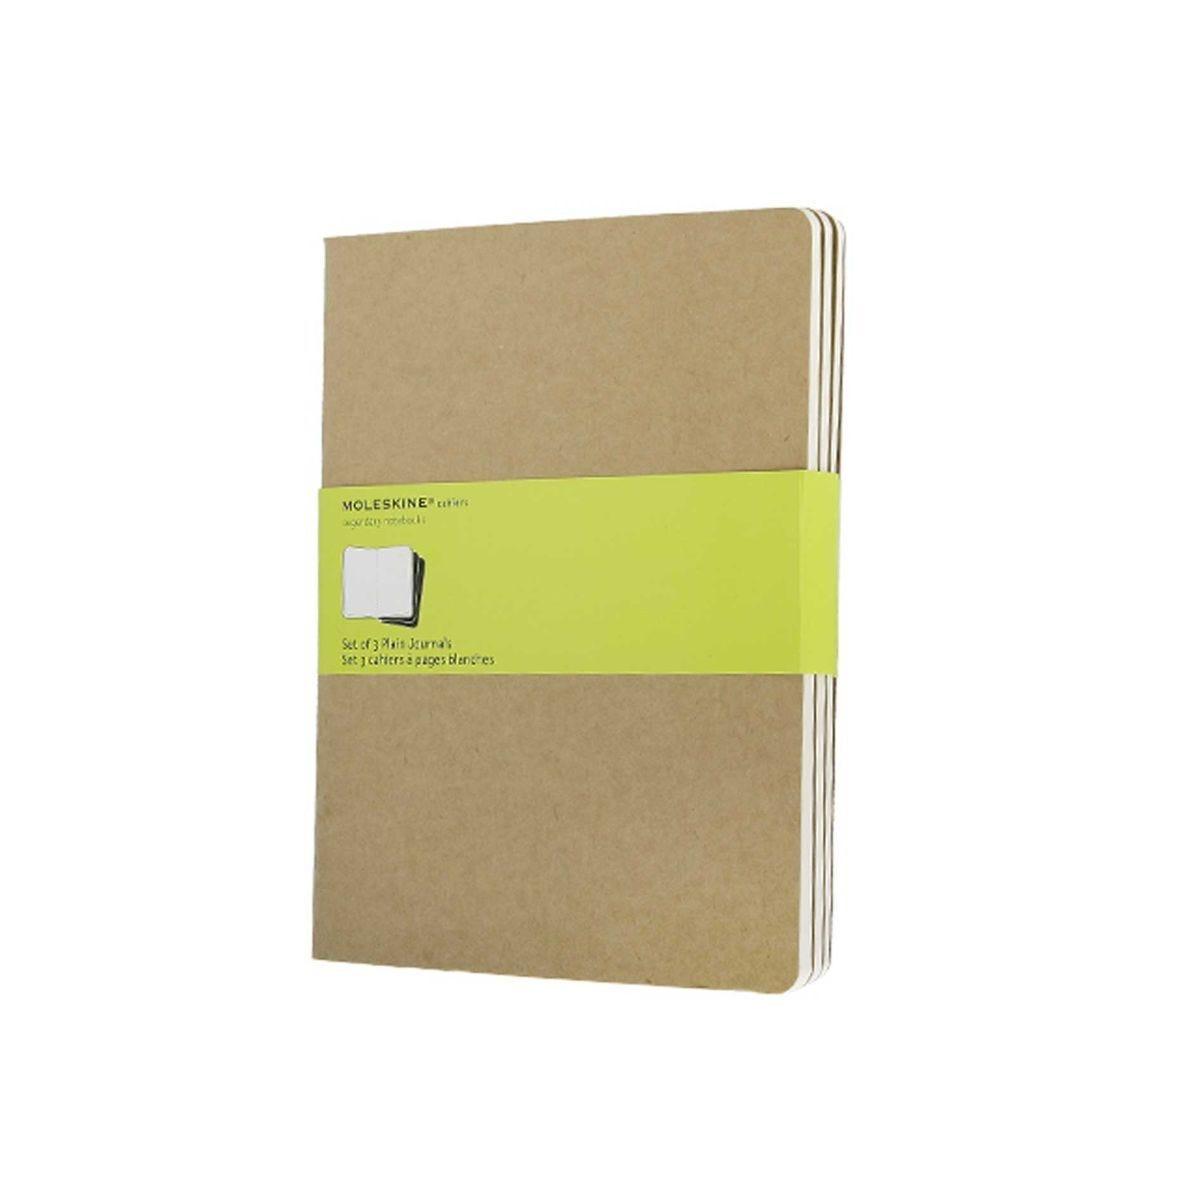 Moleskine Cahier Notebook XL Plain Pack of 3 Kraft